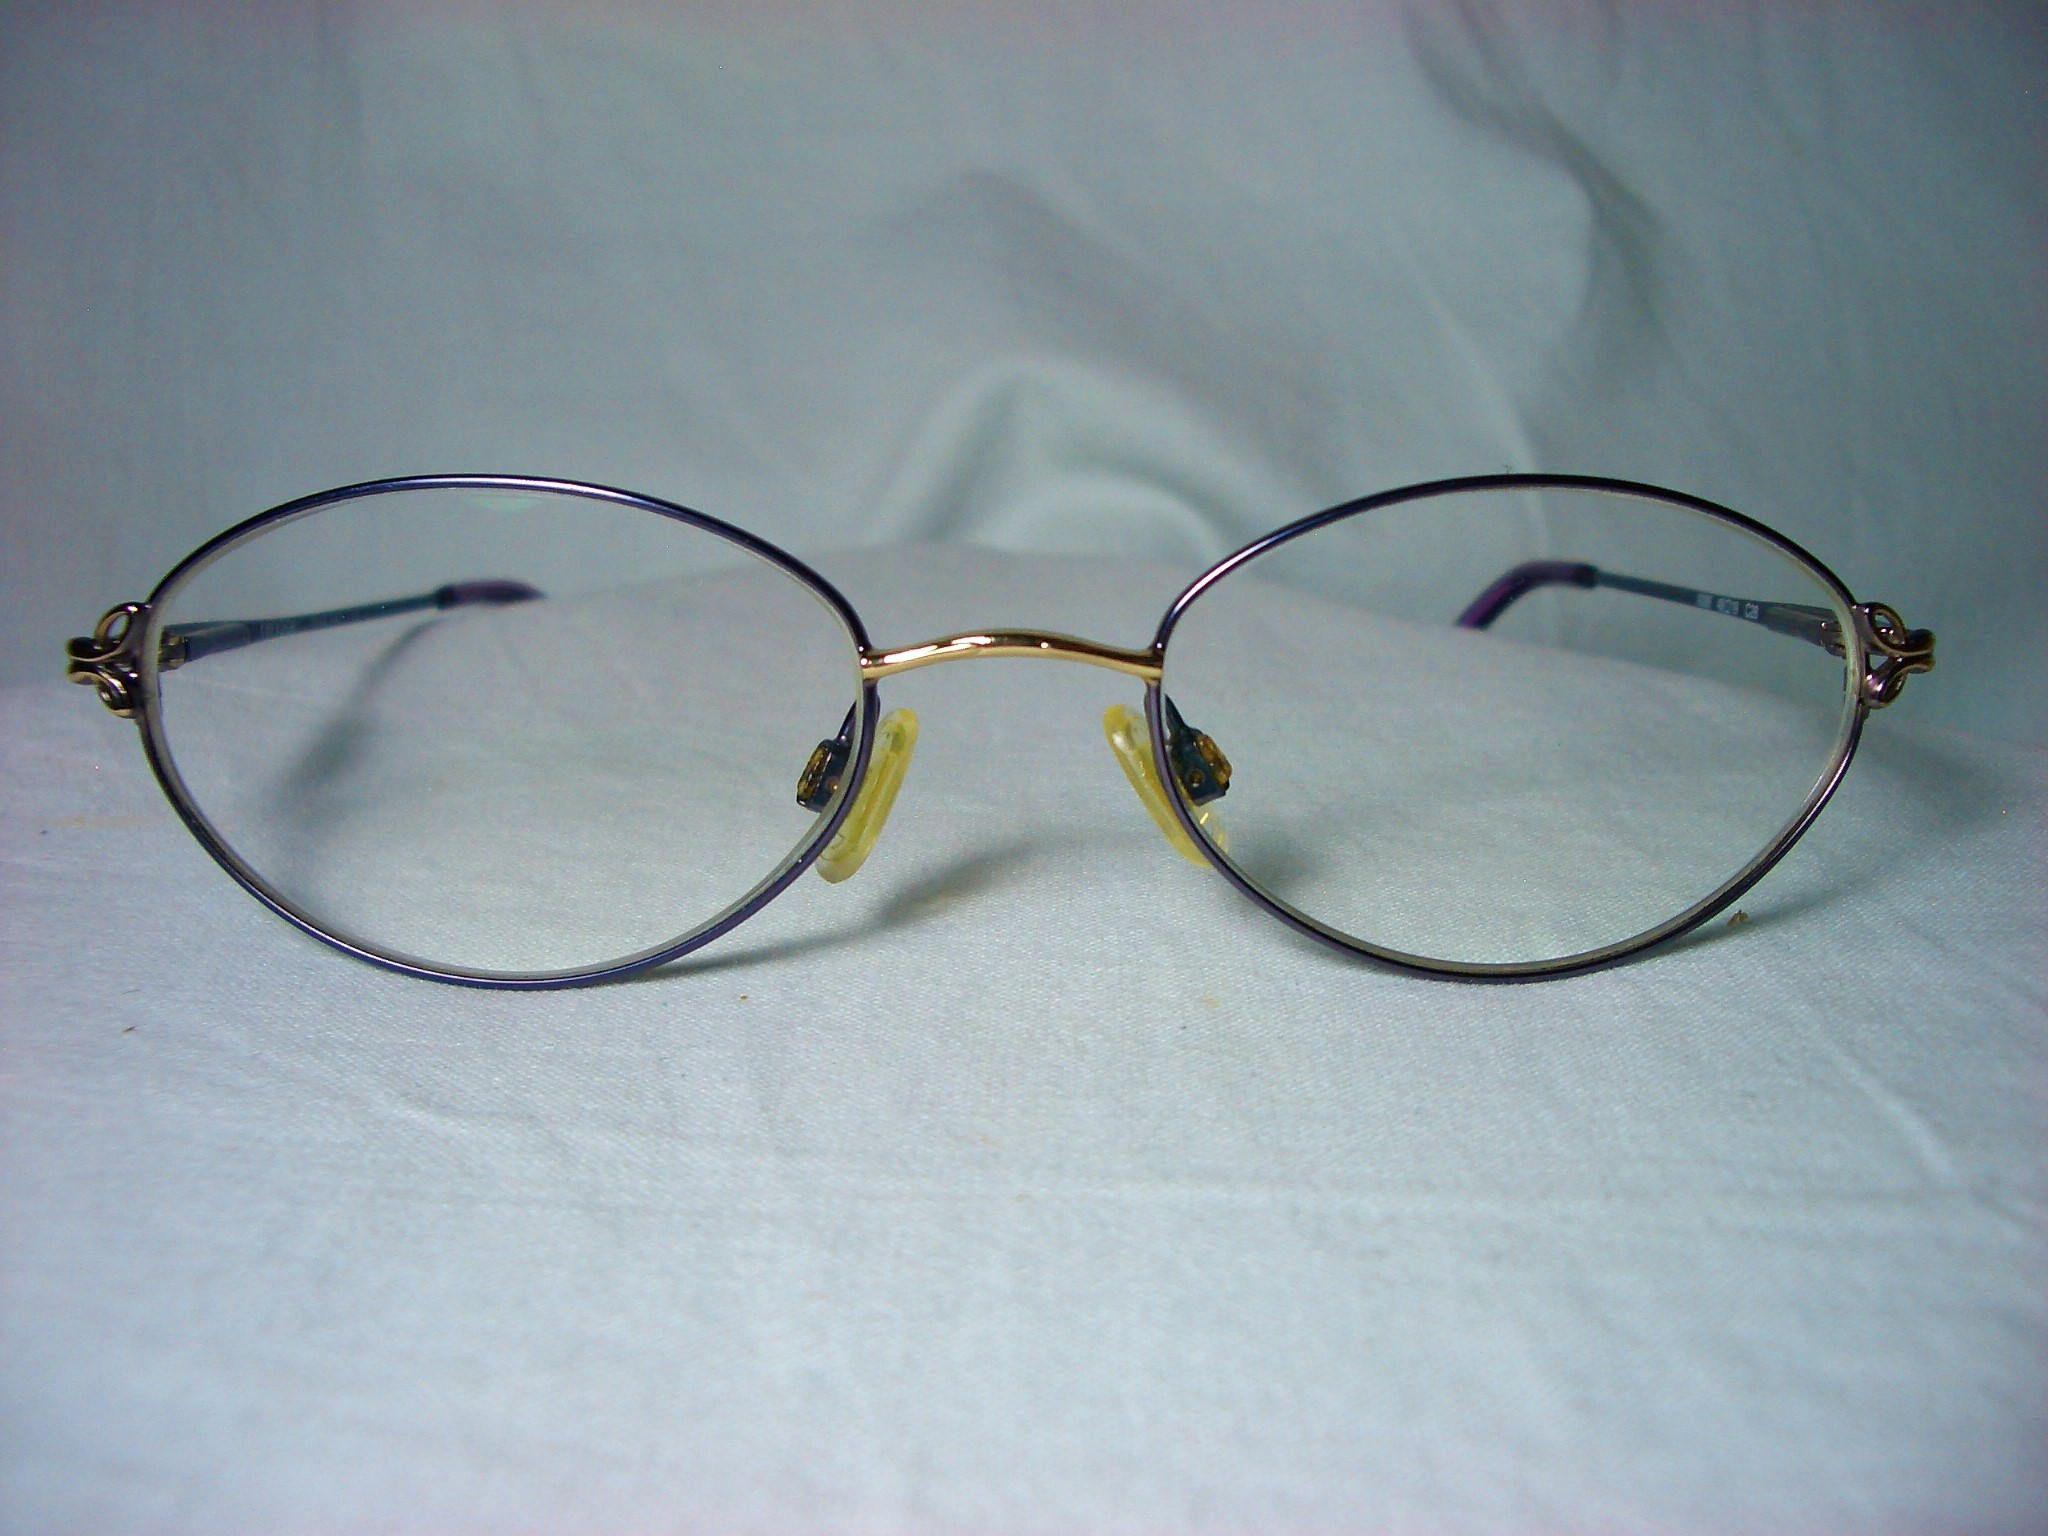 Chevron Italy Round Oval Eyeglasses Frames Women S Vintage